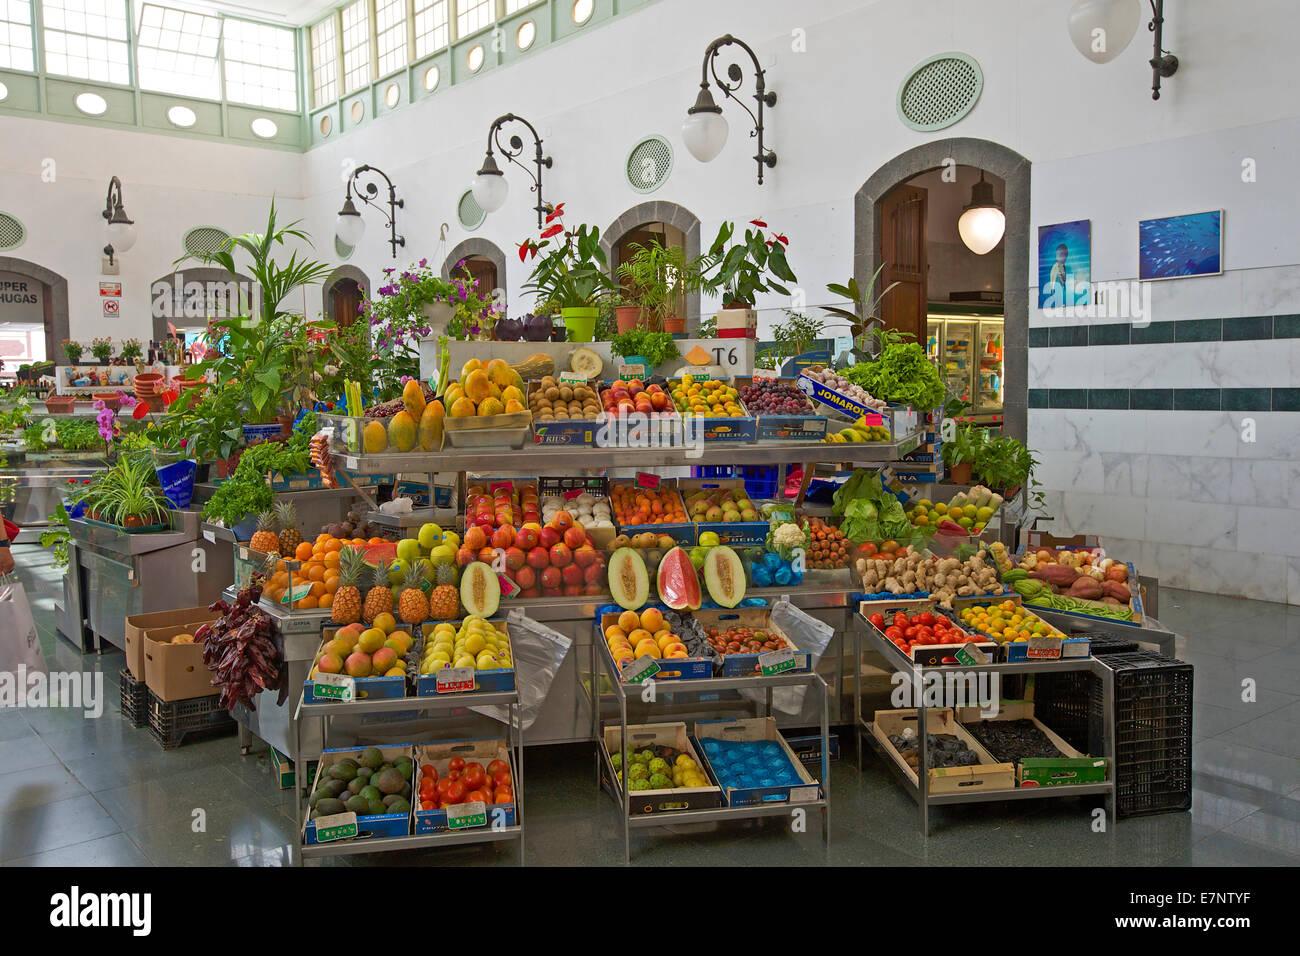 Kanaren, Kanarische Inseln, Inseln, La Palma, Spanien, Europa, Tag, niemand, bedeckt-Markt, Markt, innen, Santa Stockbild